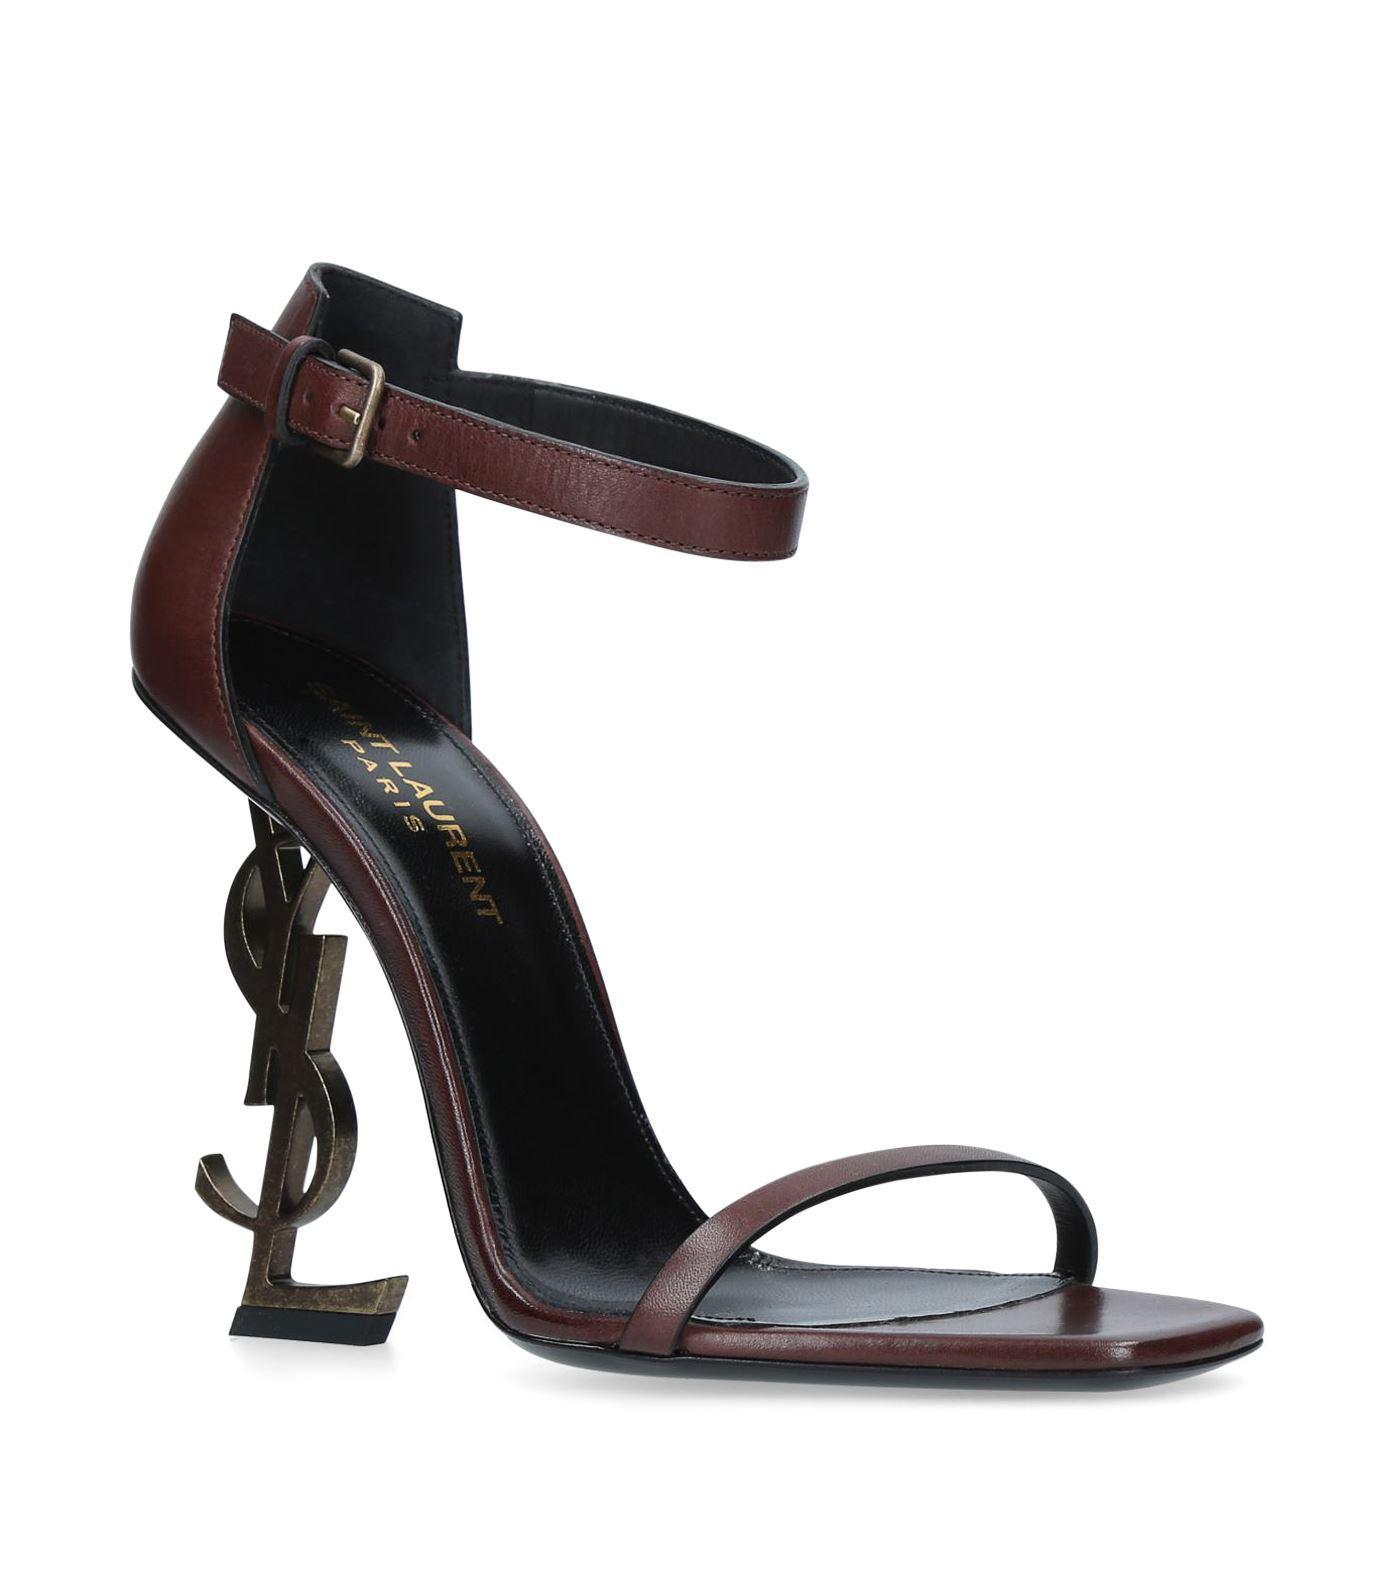 8c66923b5667 Saint Laurent Leather Opyum Sandals 110 in Brown - Lyst